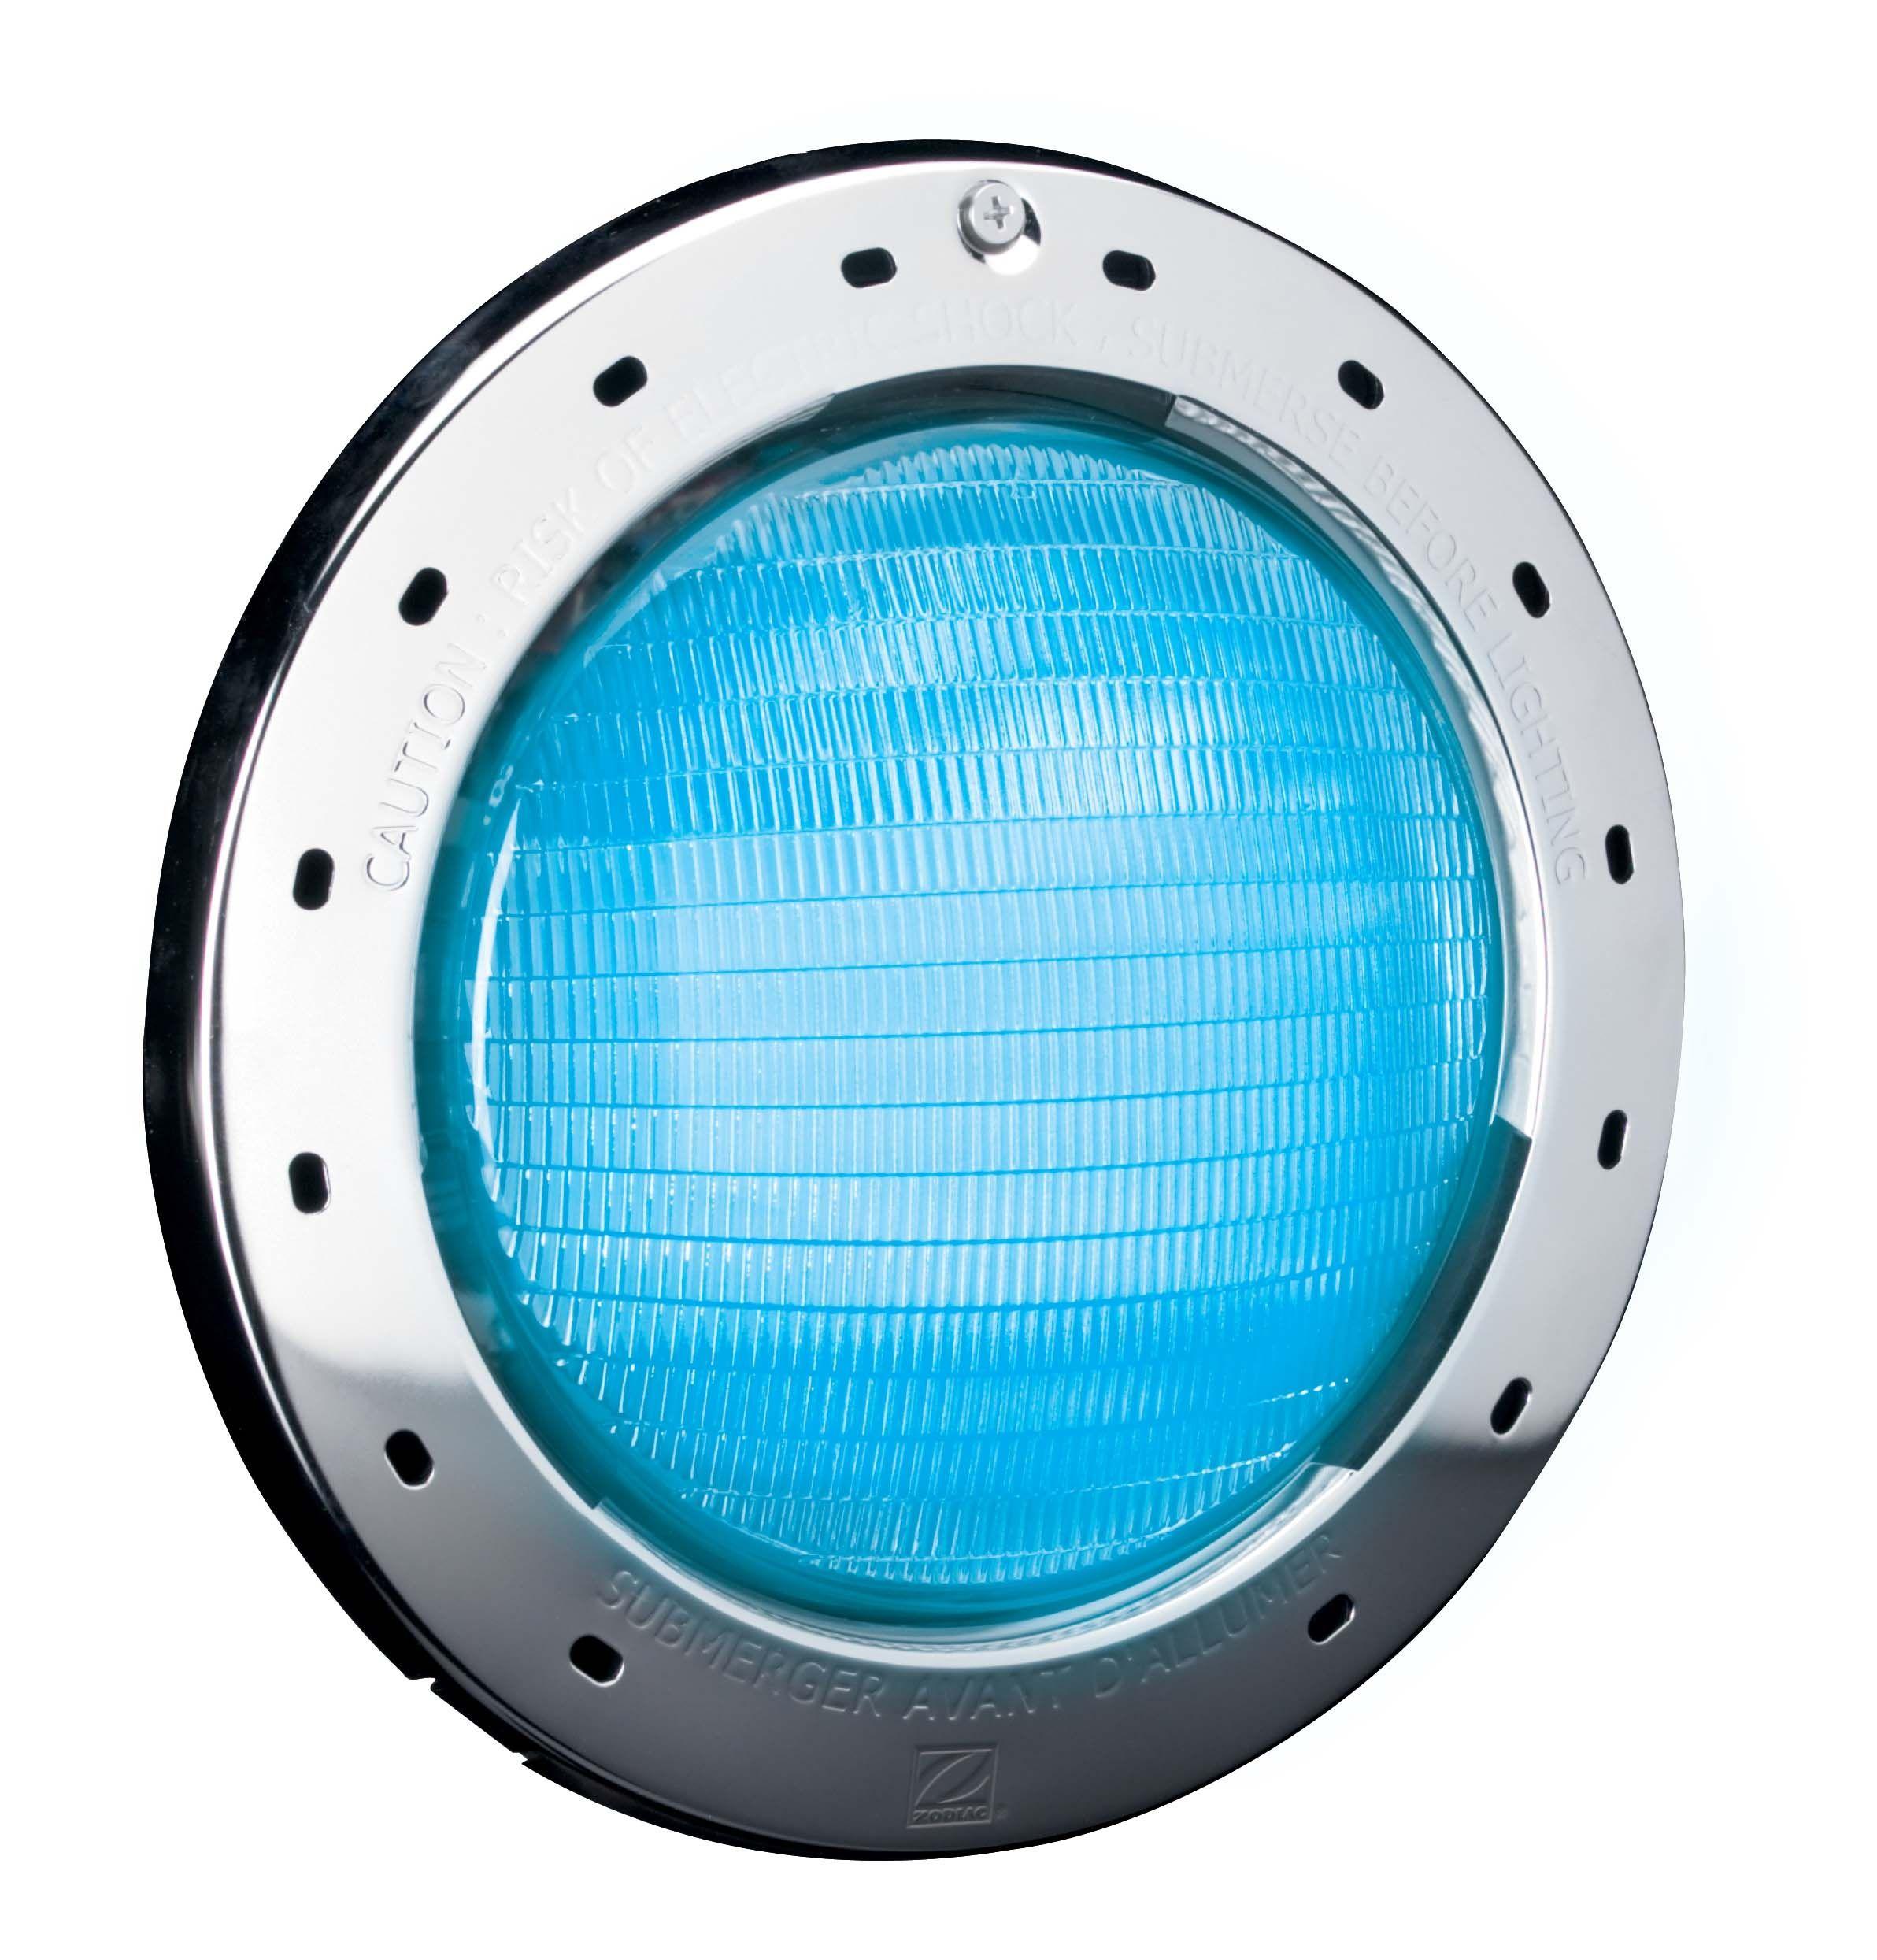 12 volt led pool light fixture httpscartclub pinterest 12 volt led pool light fixture arubaitofo Images